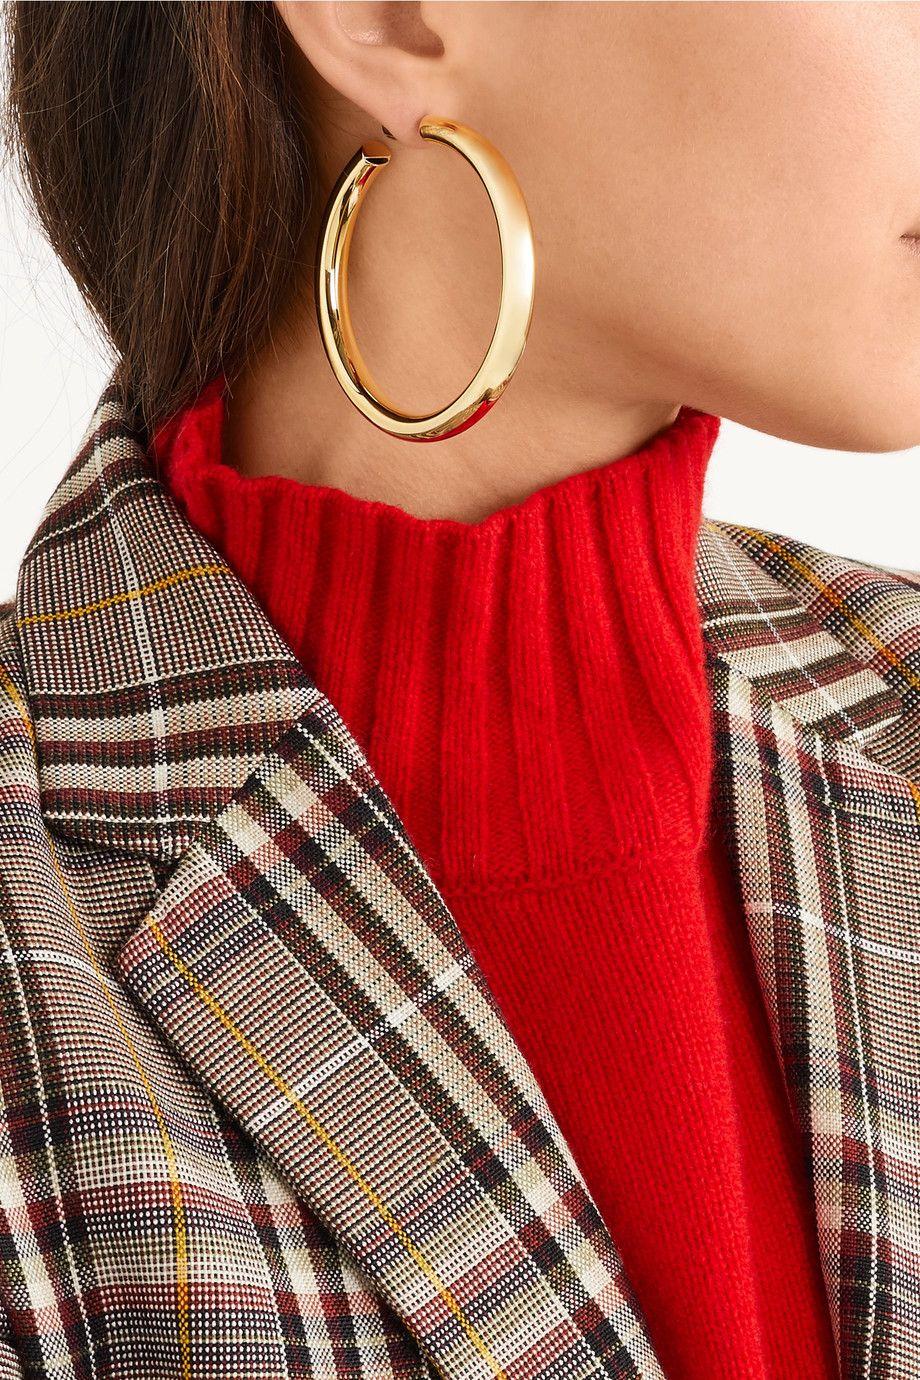 2993eaa33 Jennifer Fisher | Samira gold-plated hoop earrings | NET-A-PORTER.COM